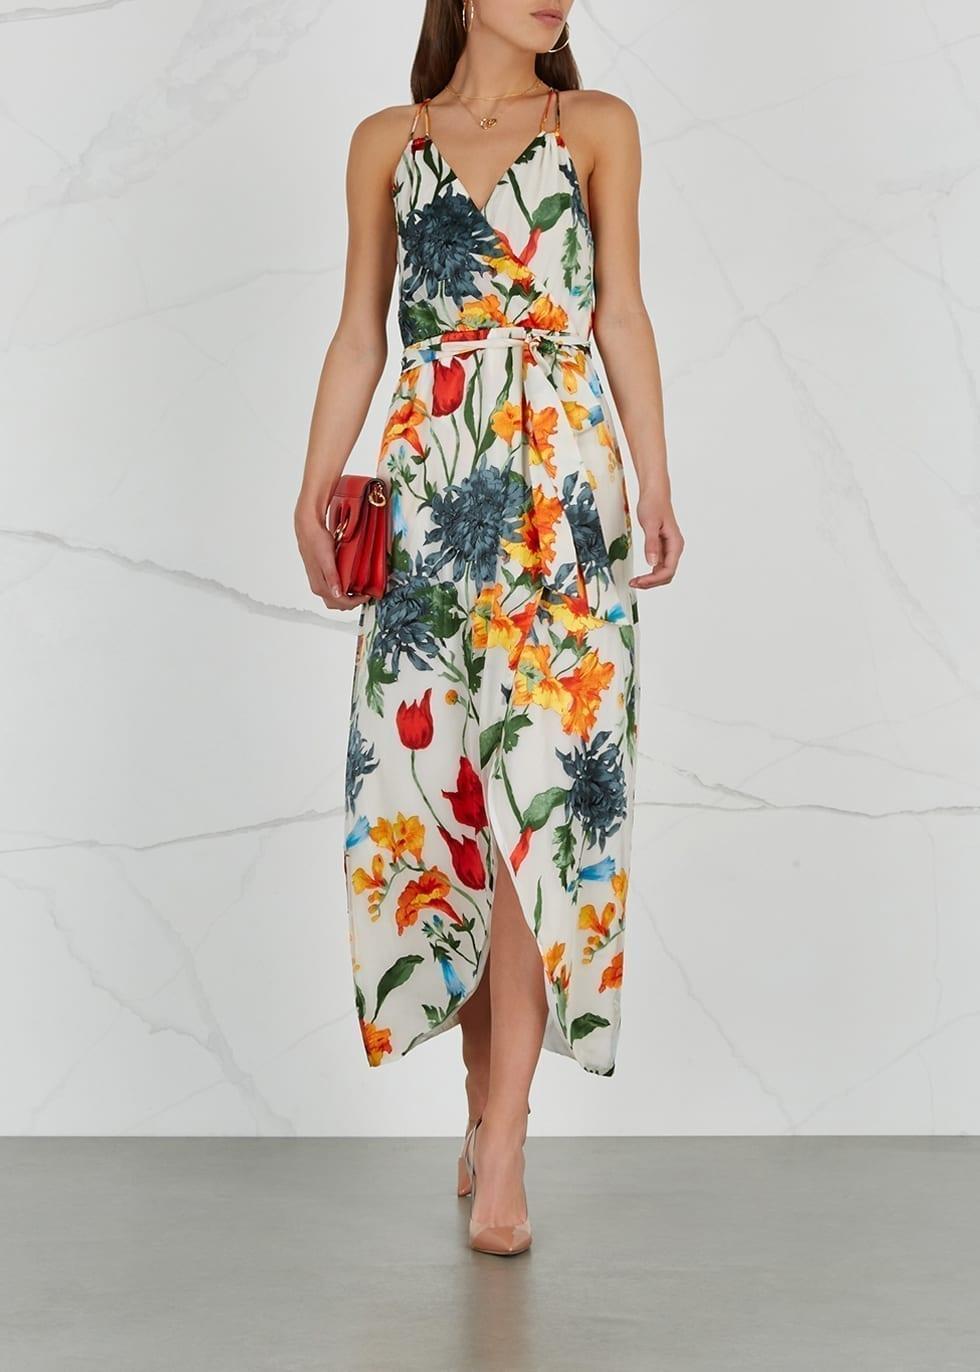 ALICE + OLIVIA Susana Devoré Chiffon Multi / Floral Printed Dress ...